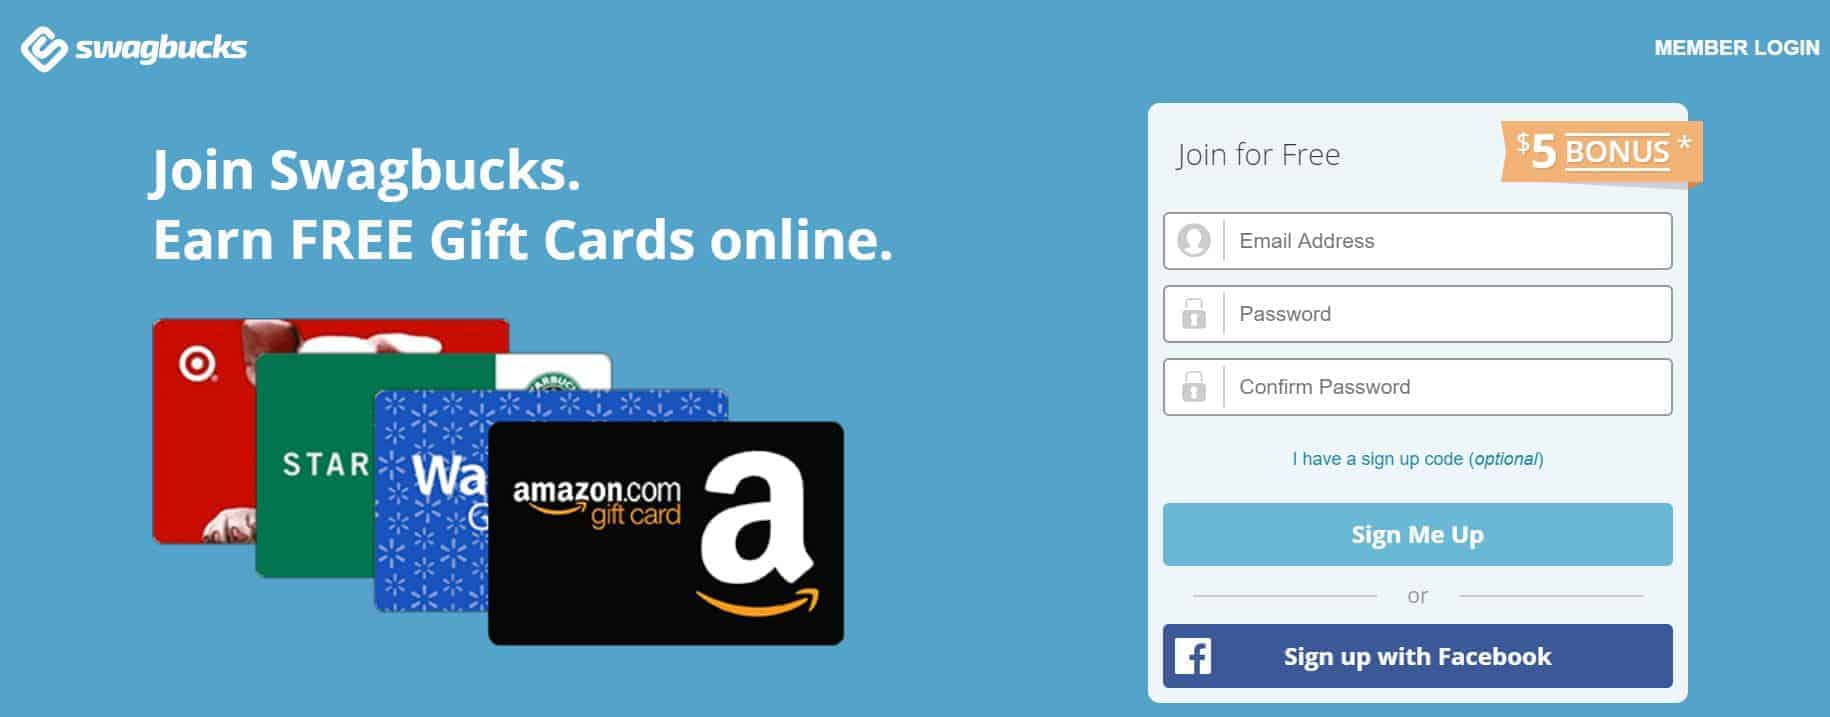 Swagbucks home page